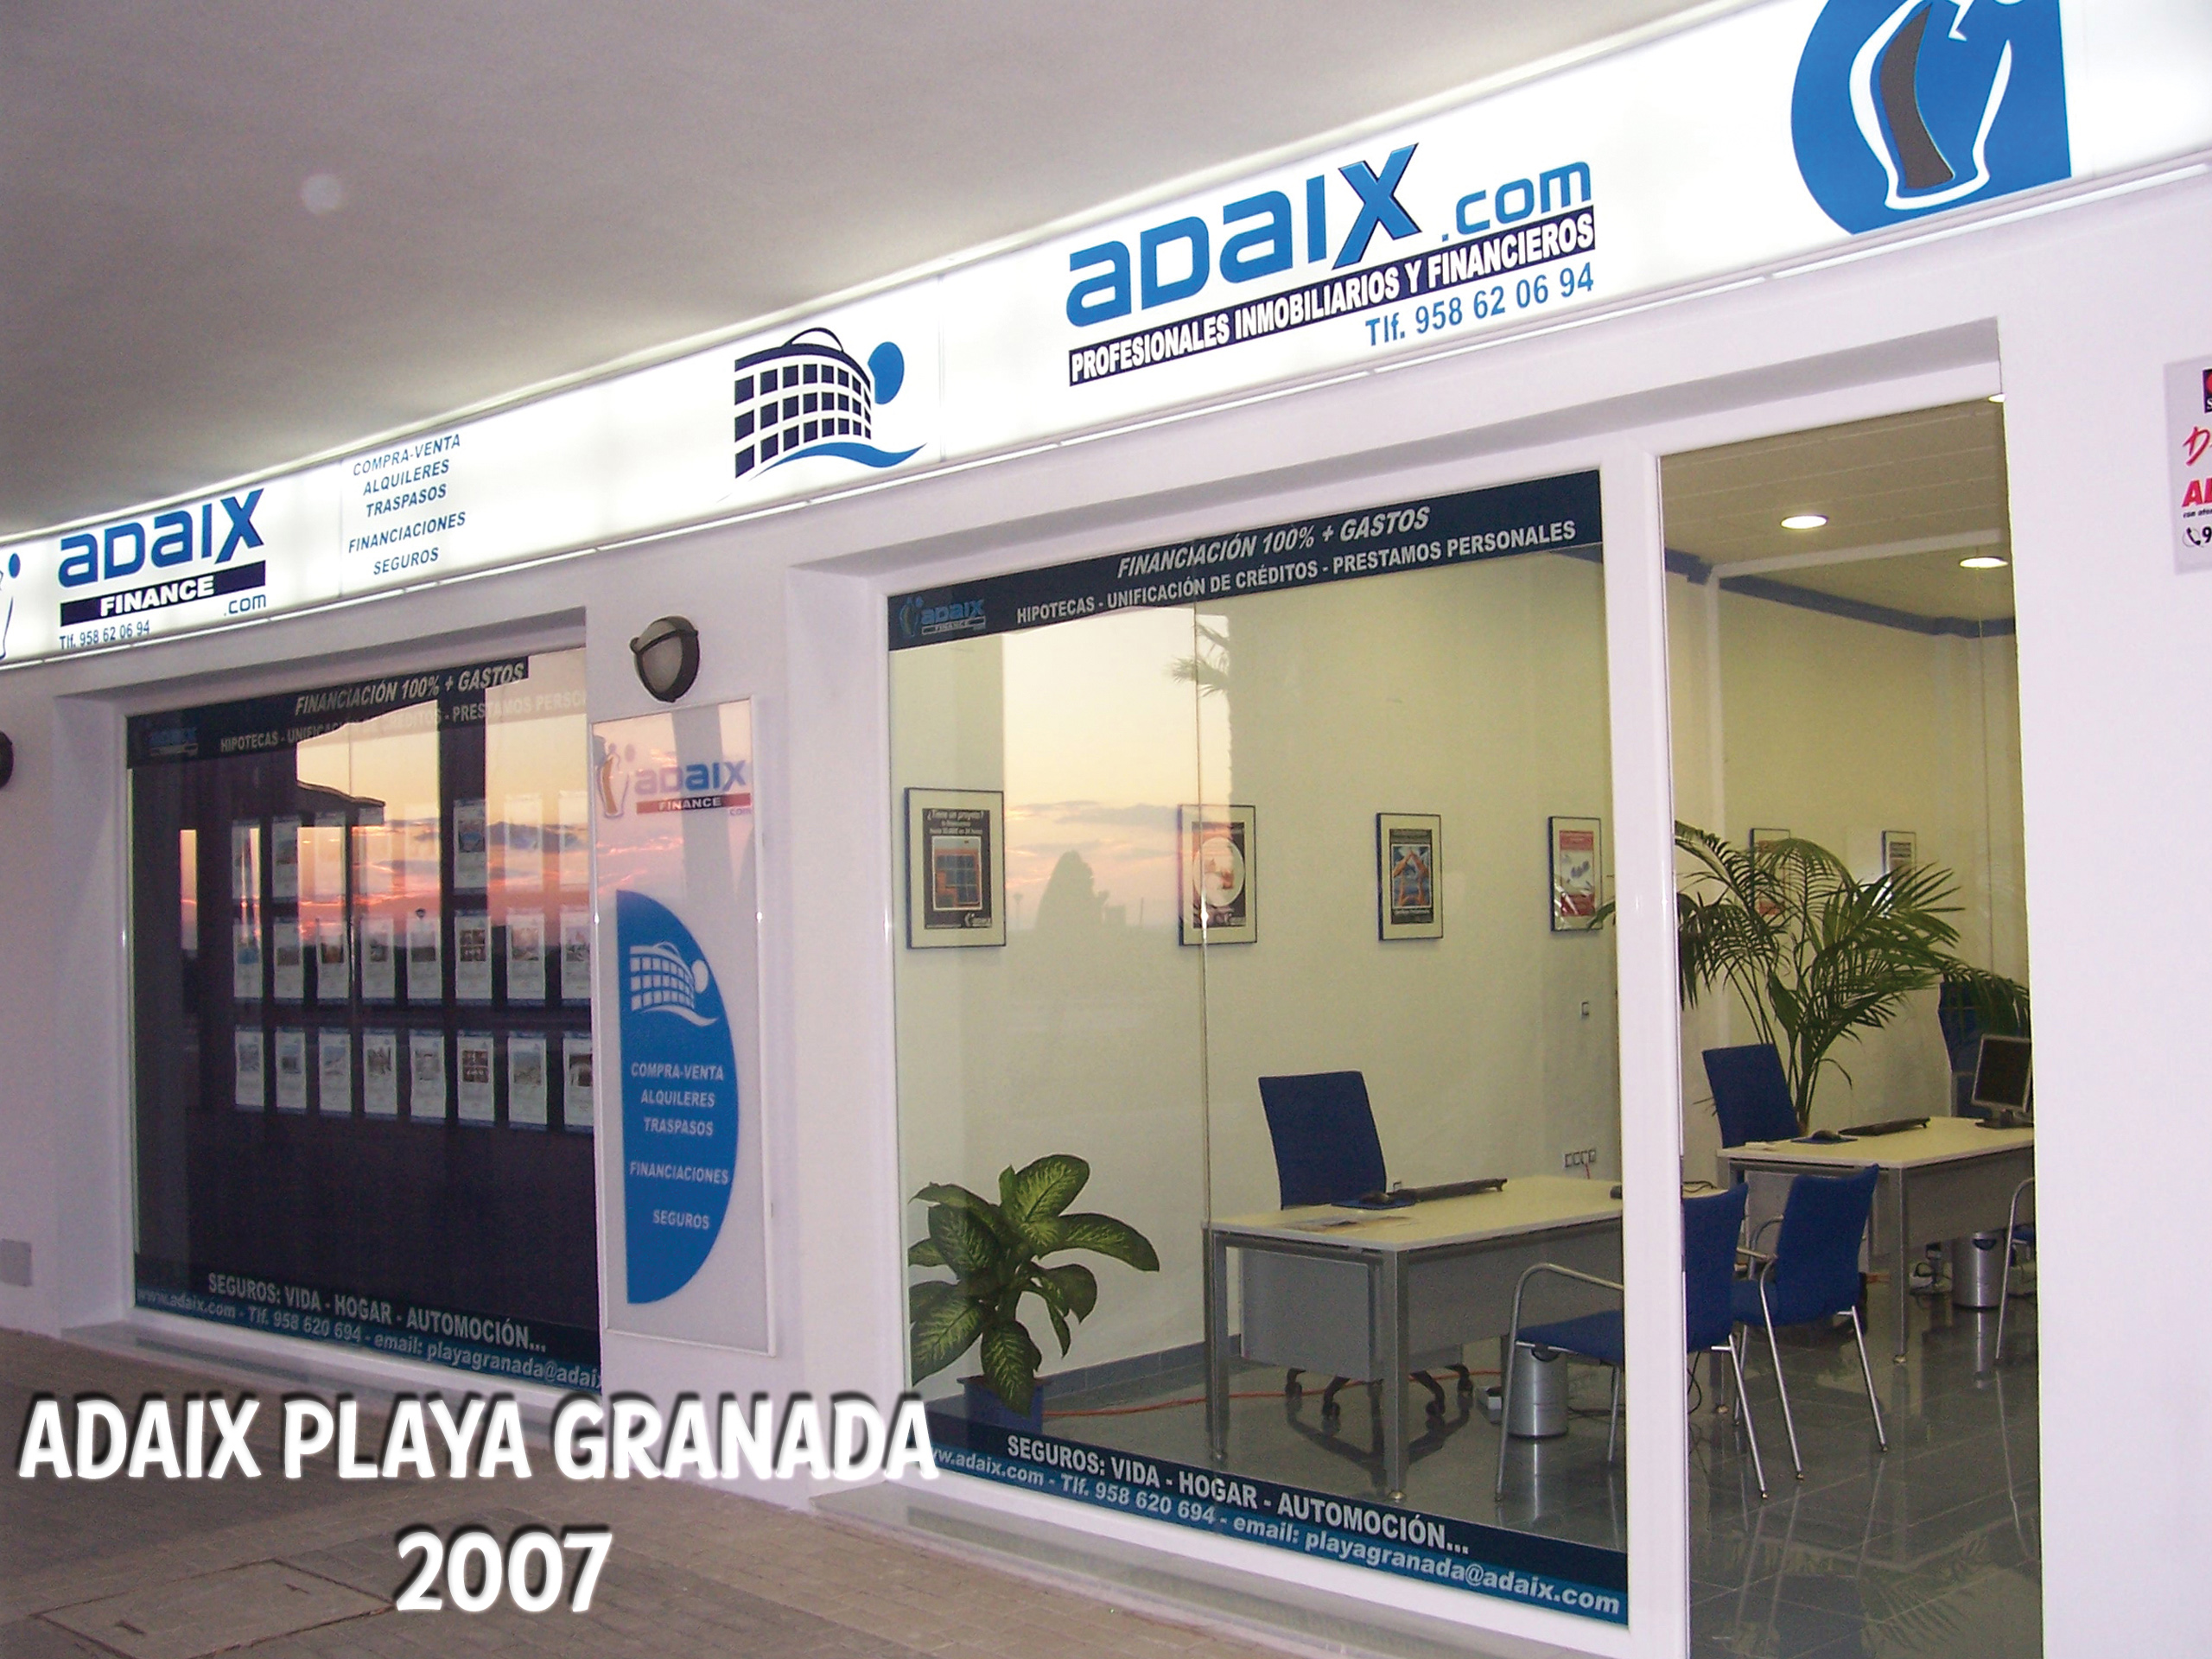 Adaix Playa Granada 2007